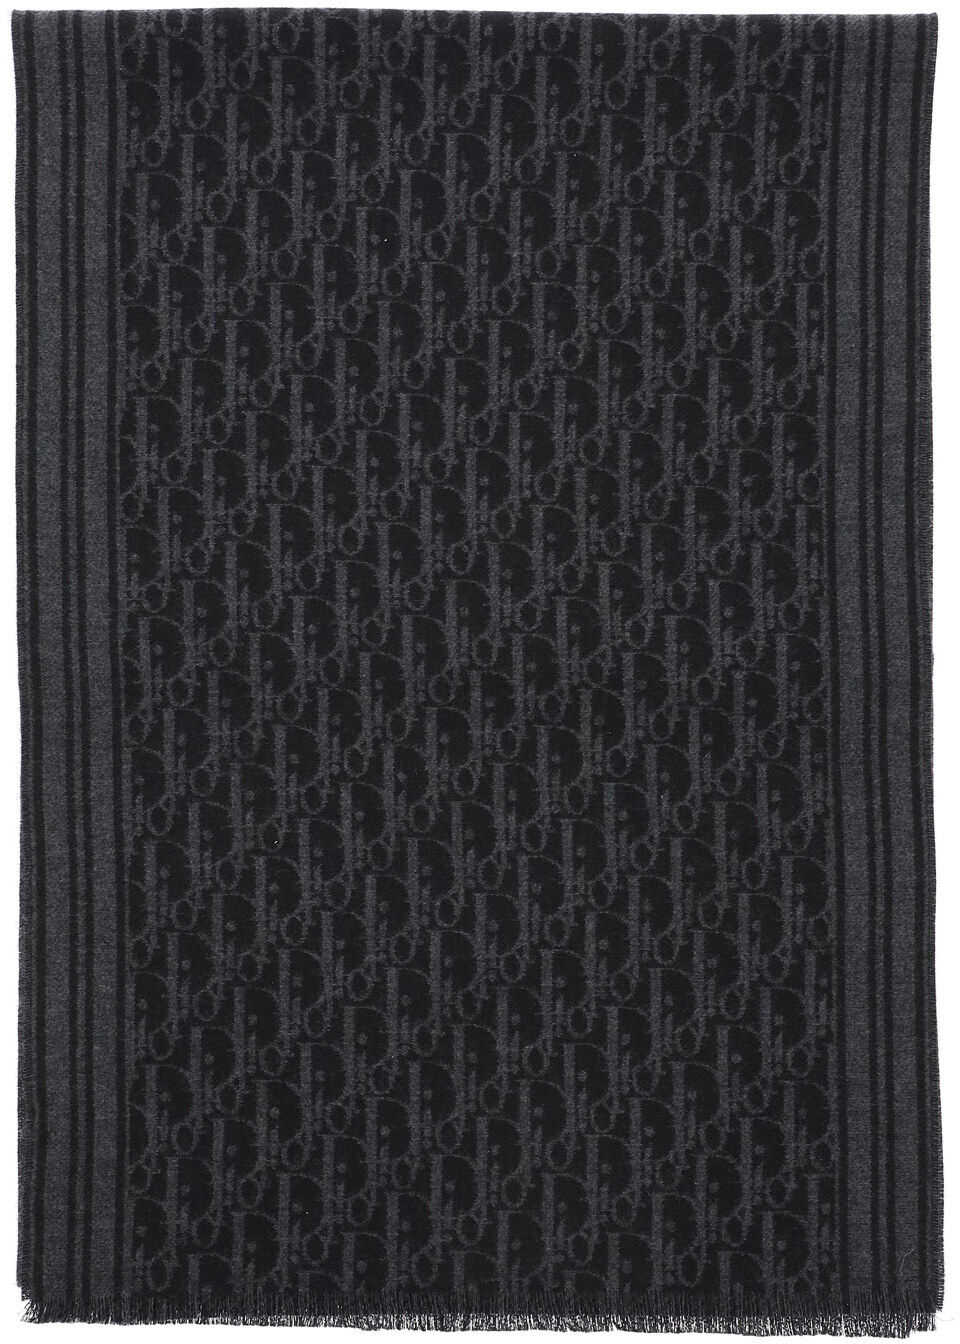 Dior Cachemire Oblique Scarf BLACK